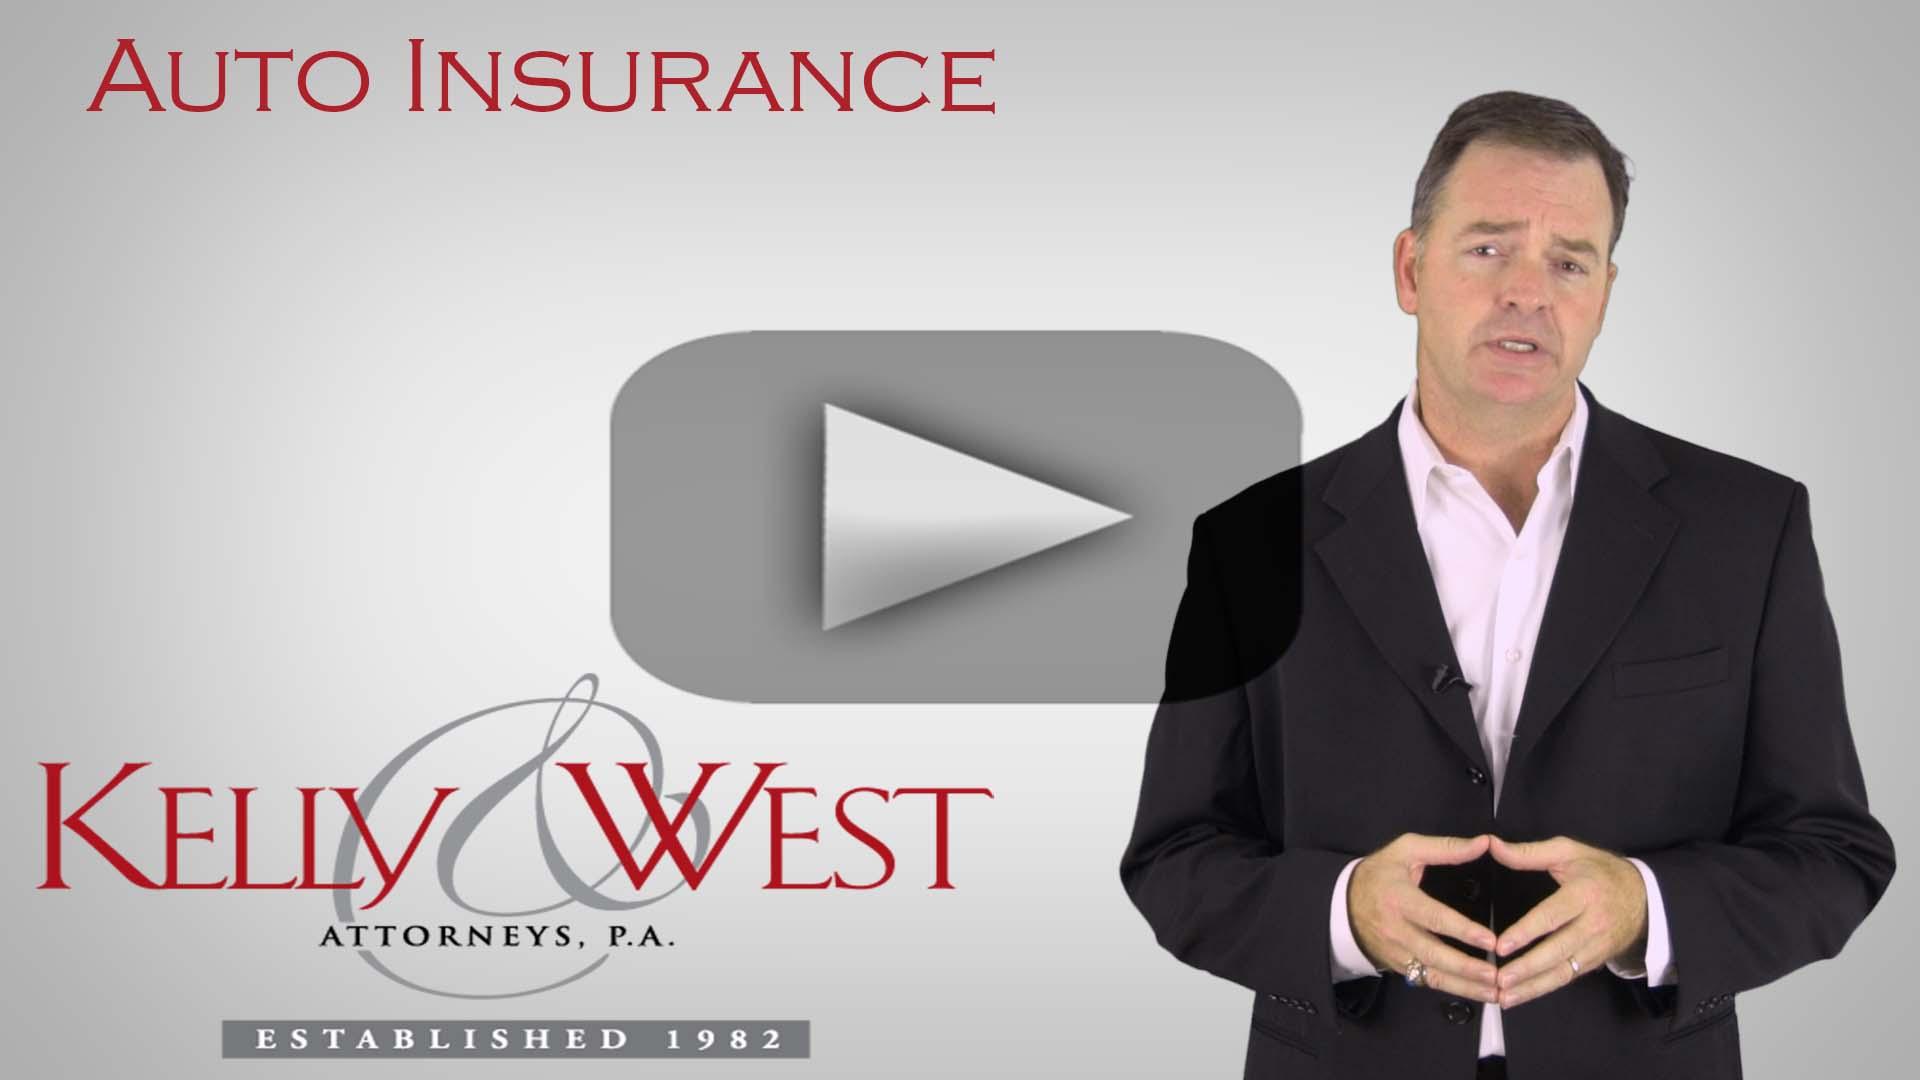 Auto Insurance - Kel